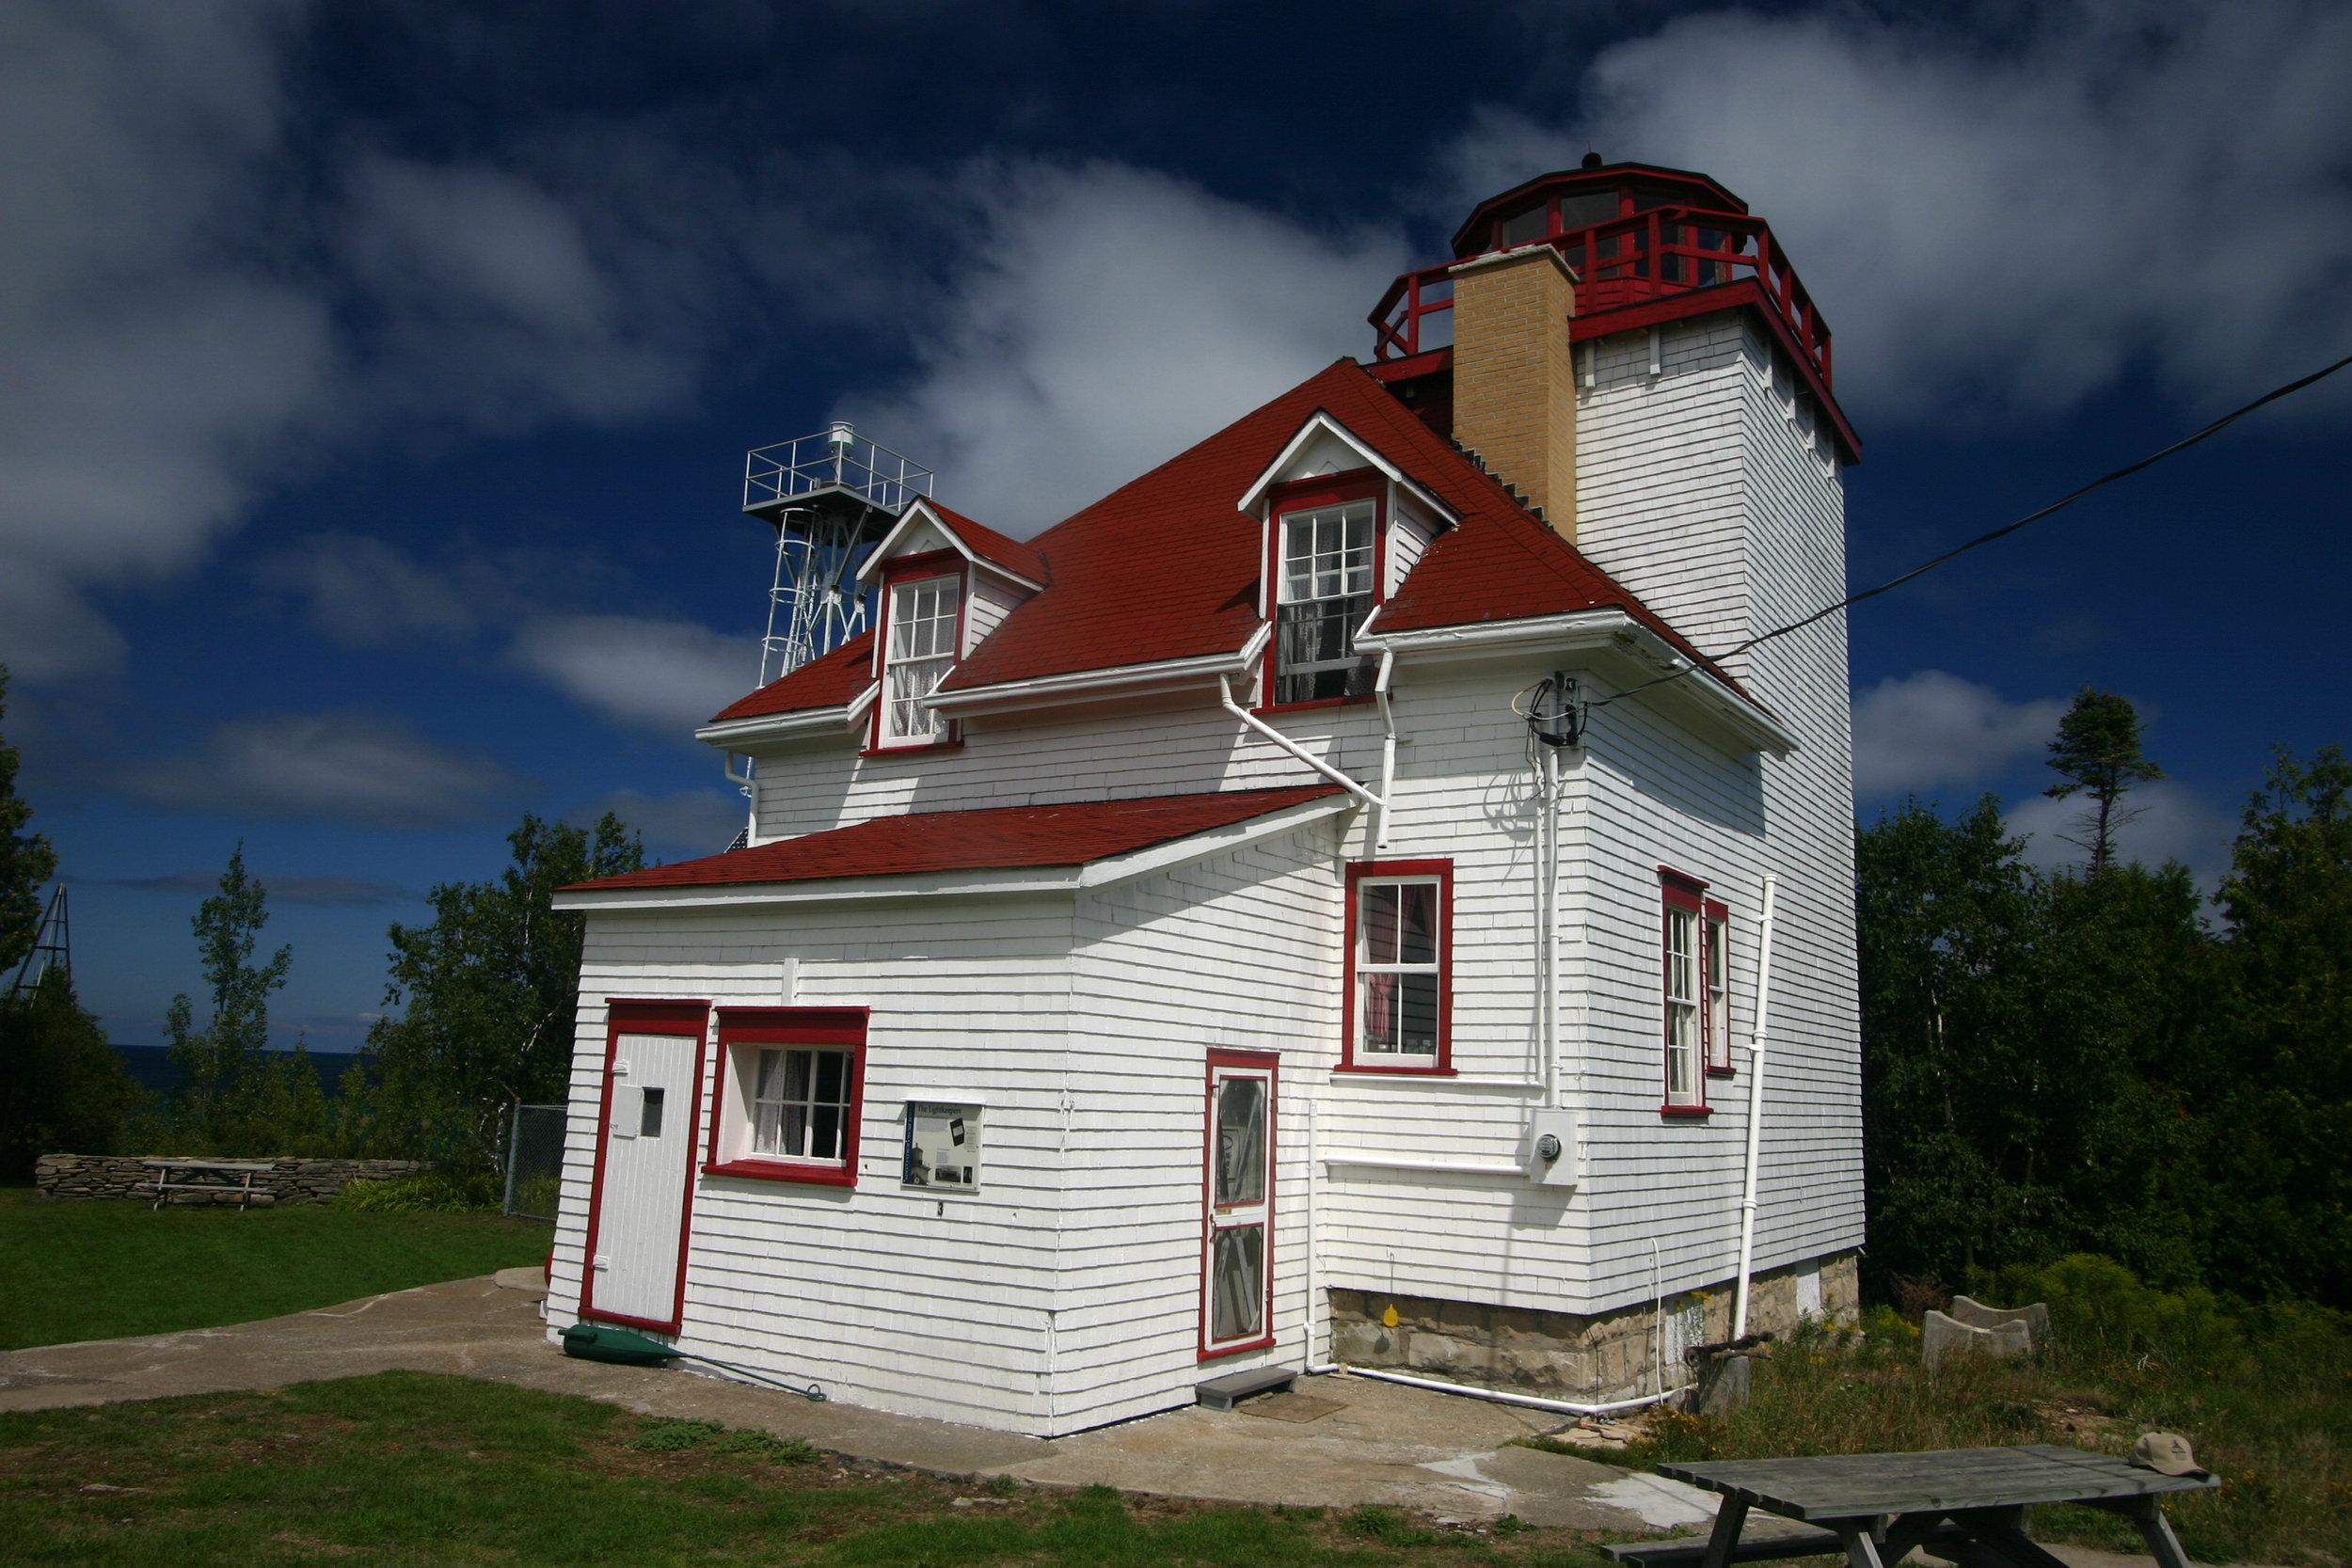 cabot Head LIGHTHOUSE - Cabot Head lighthouse is the turn around halfway through the 80 km Route